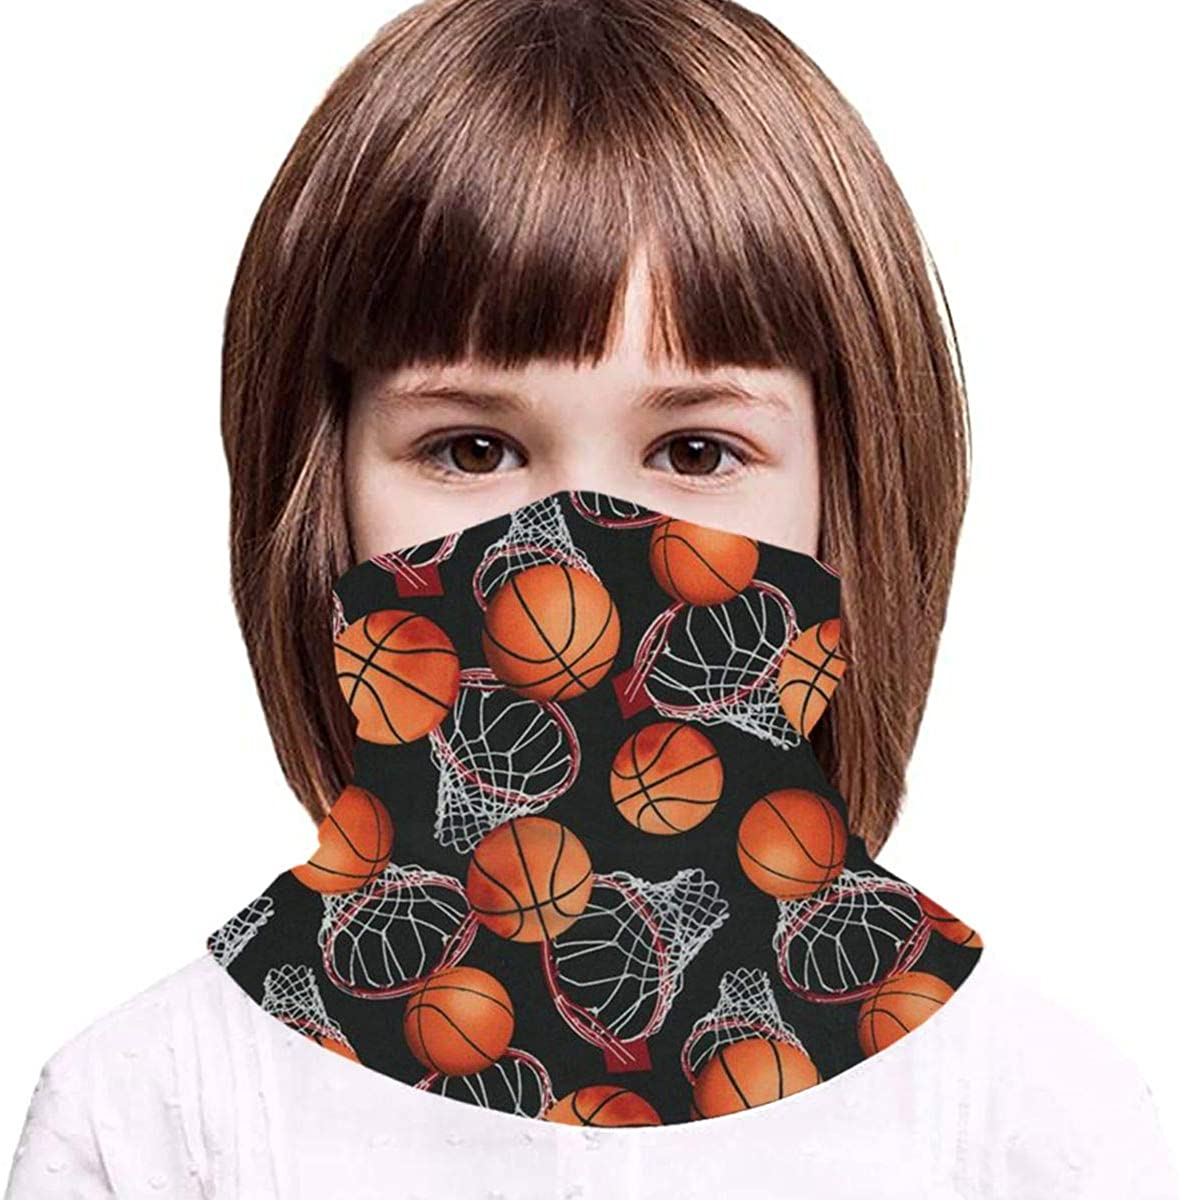 Basketball On Black Headwear For Girls And Boys, Head Wrap, Neck Gaiter, Headband, Tenn Fishing Mask, Magic Scarf, Tube Mask, Face Bandana Mask For Camping Running Cycling